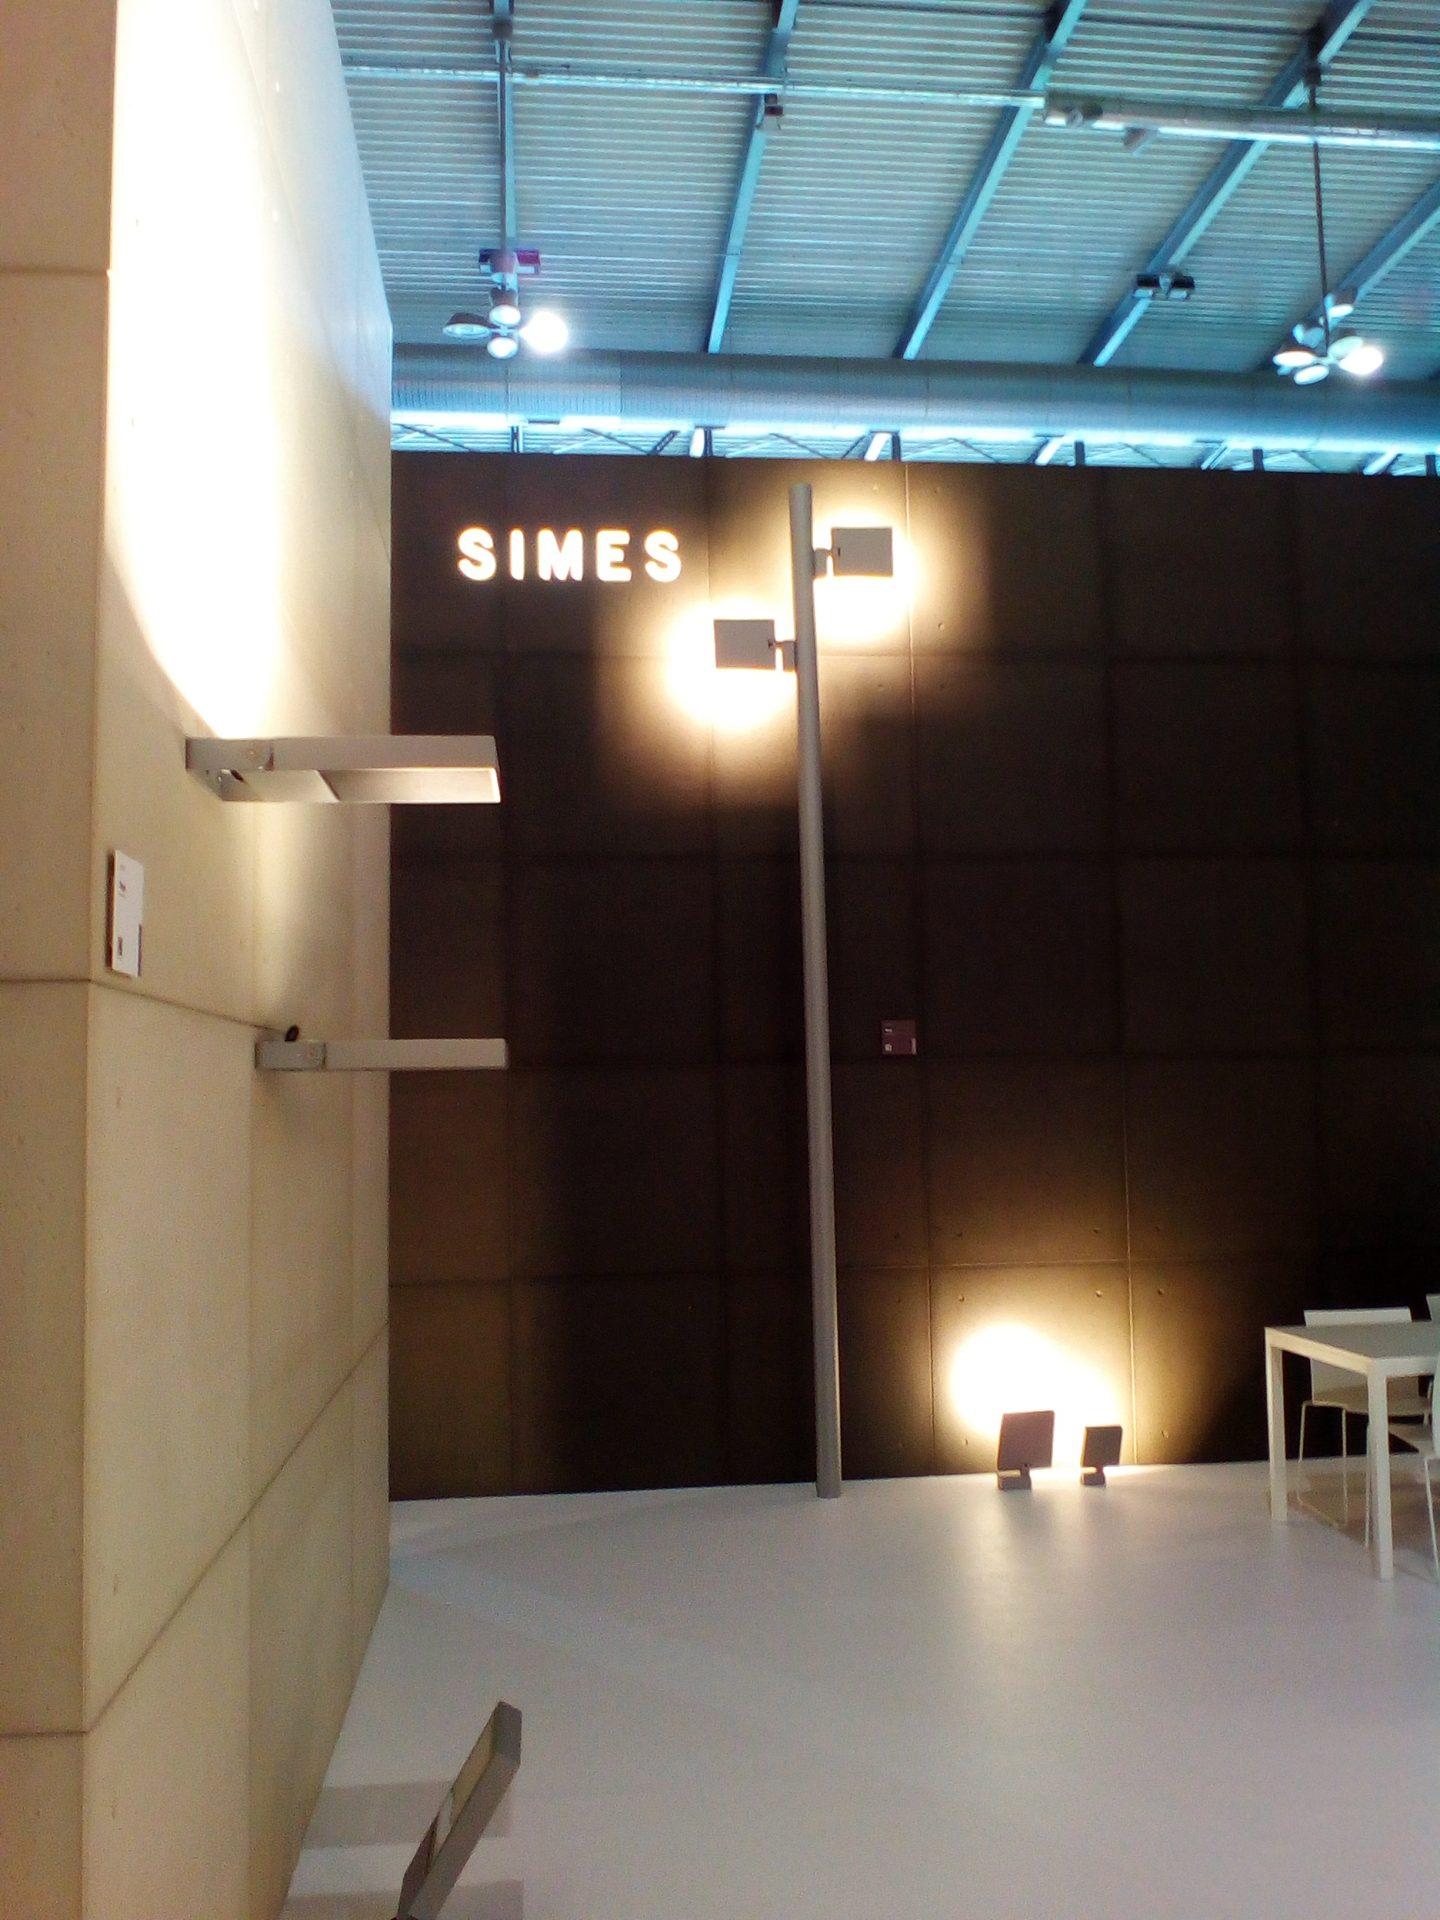 Da Rocco illuminazione a Brescia i modelli Simes presentati a EUROLUCE